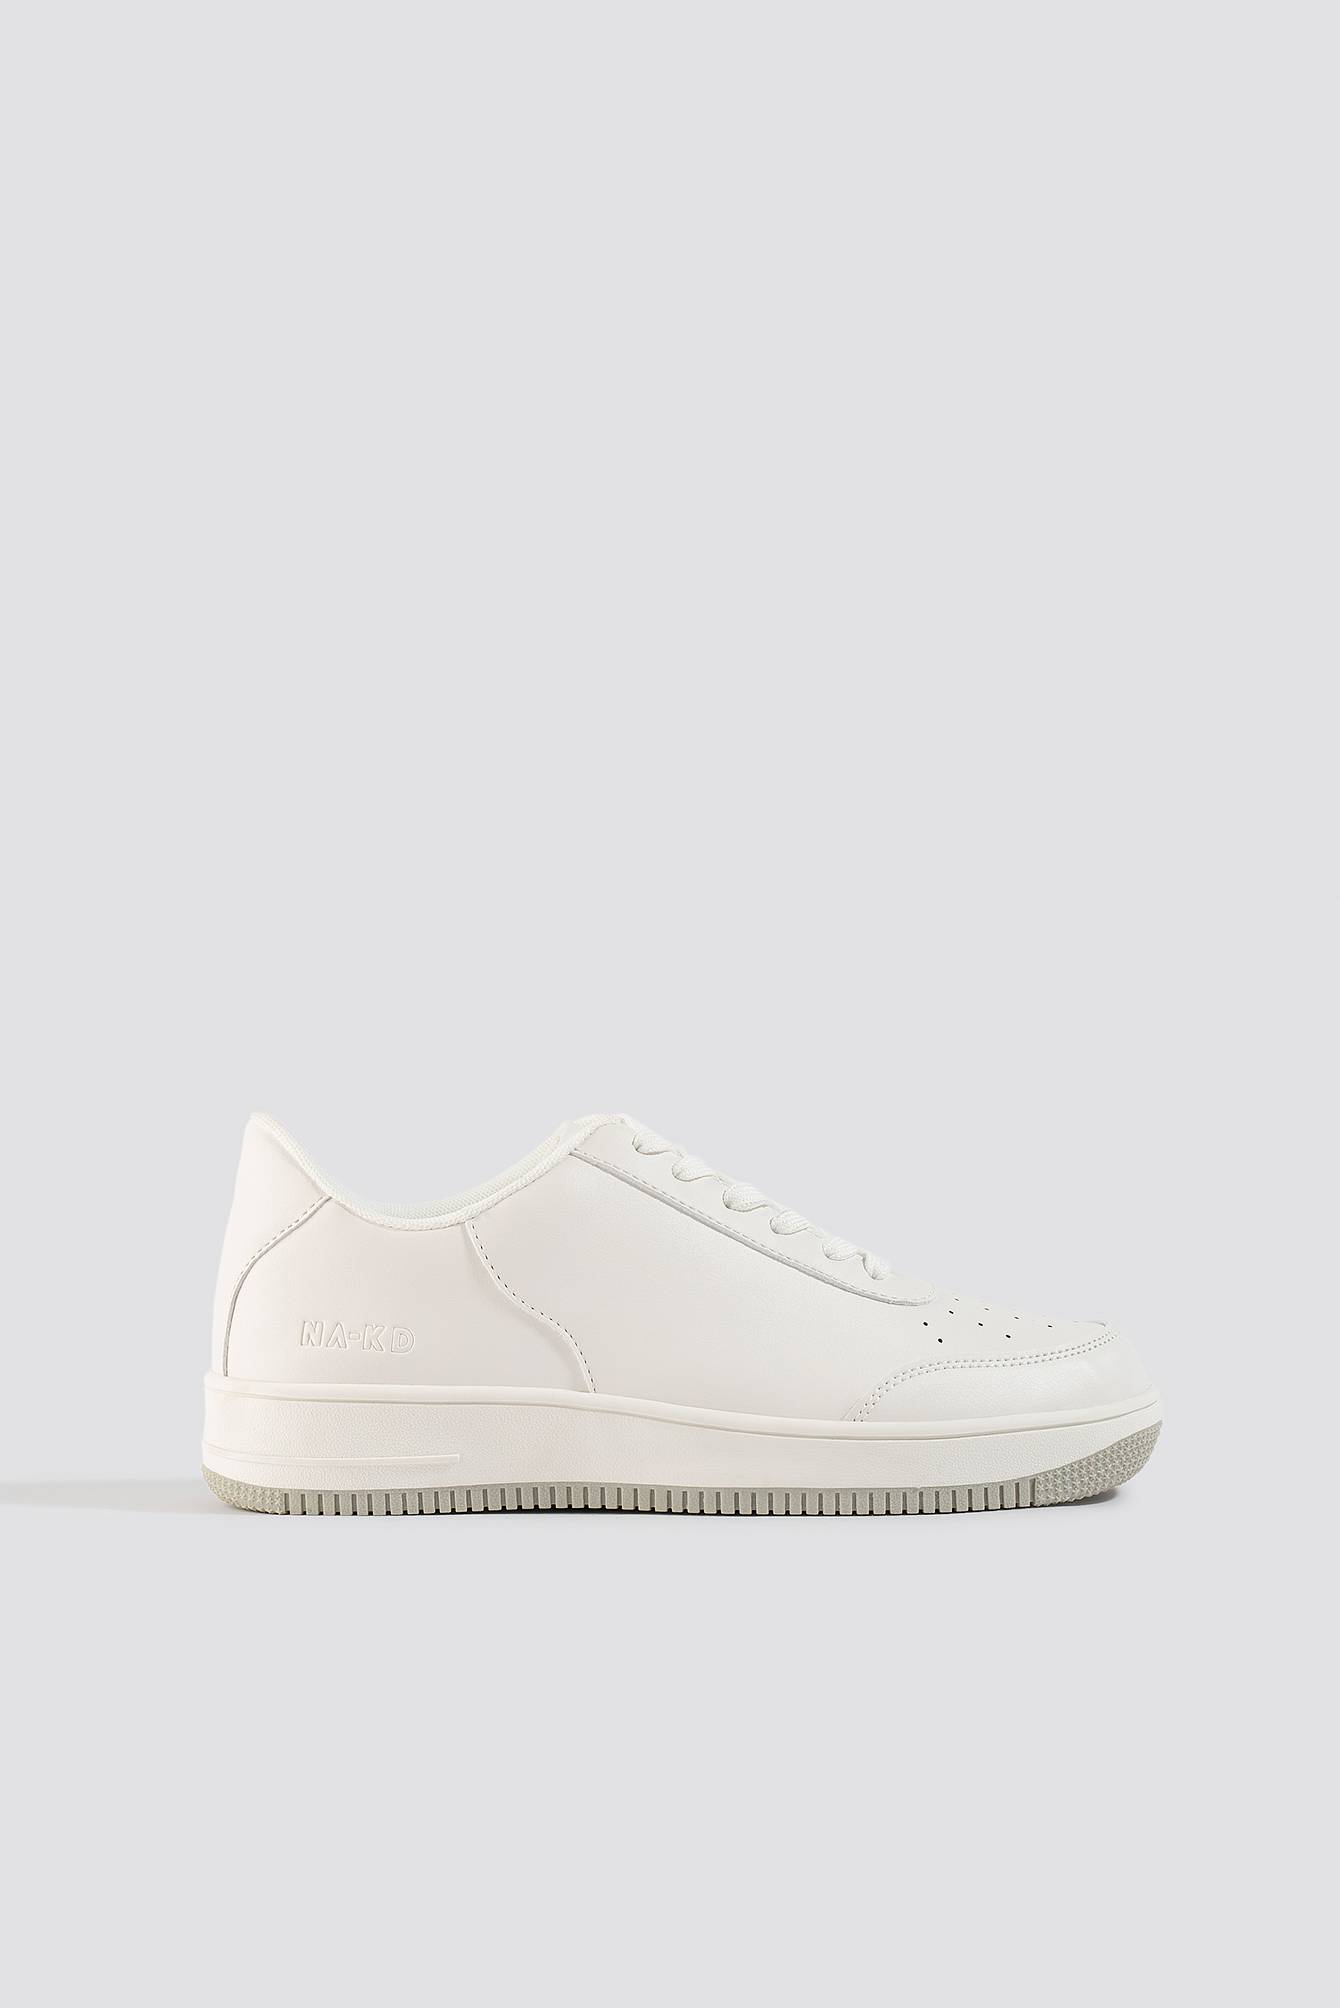 NA-KD Shoes Basic Sneakers - White  - Size: EU 36,EU 37,EU 38,EU 39,EU 40,EU 41